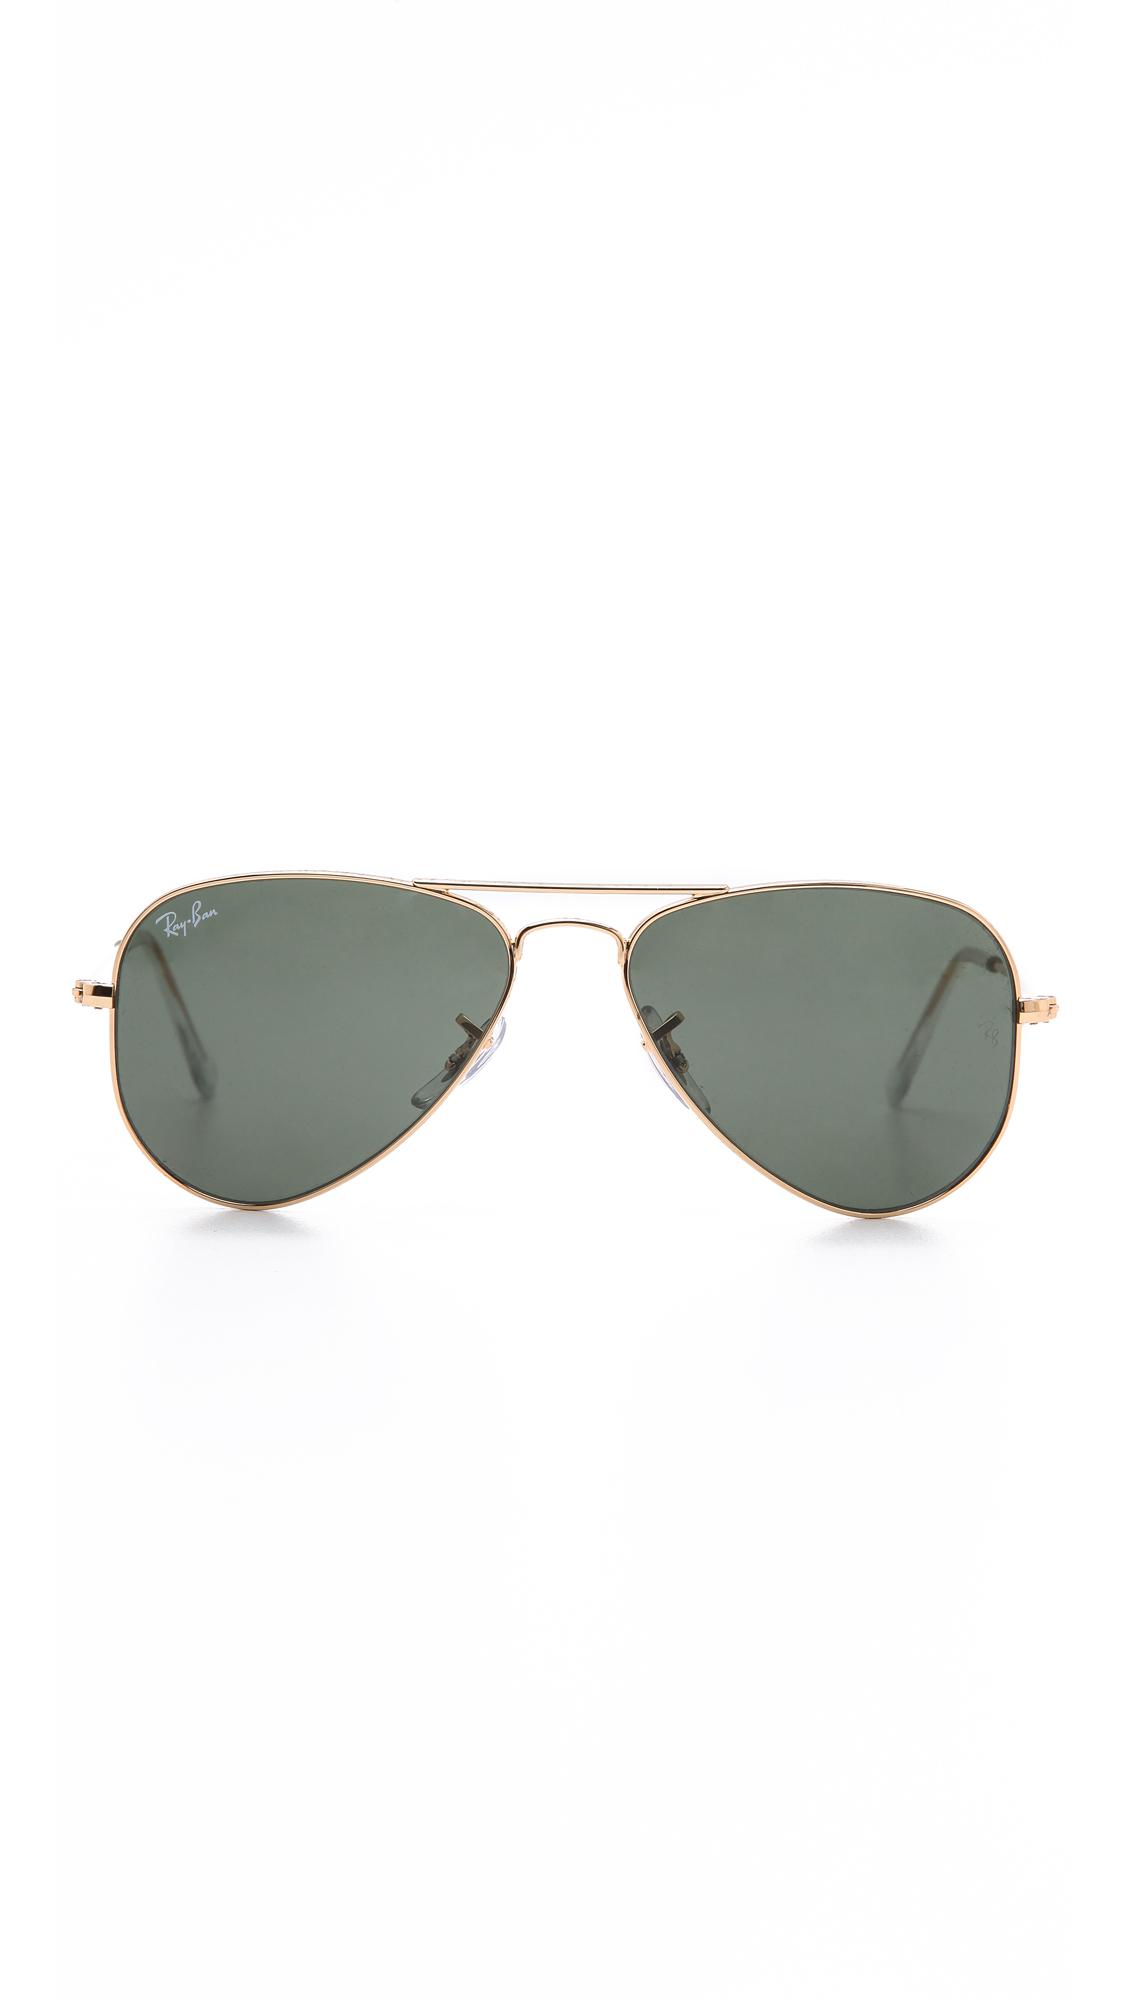 Ray-Ban Солнцезащитные очки авиаторы Shrunken | SHOPBOP